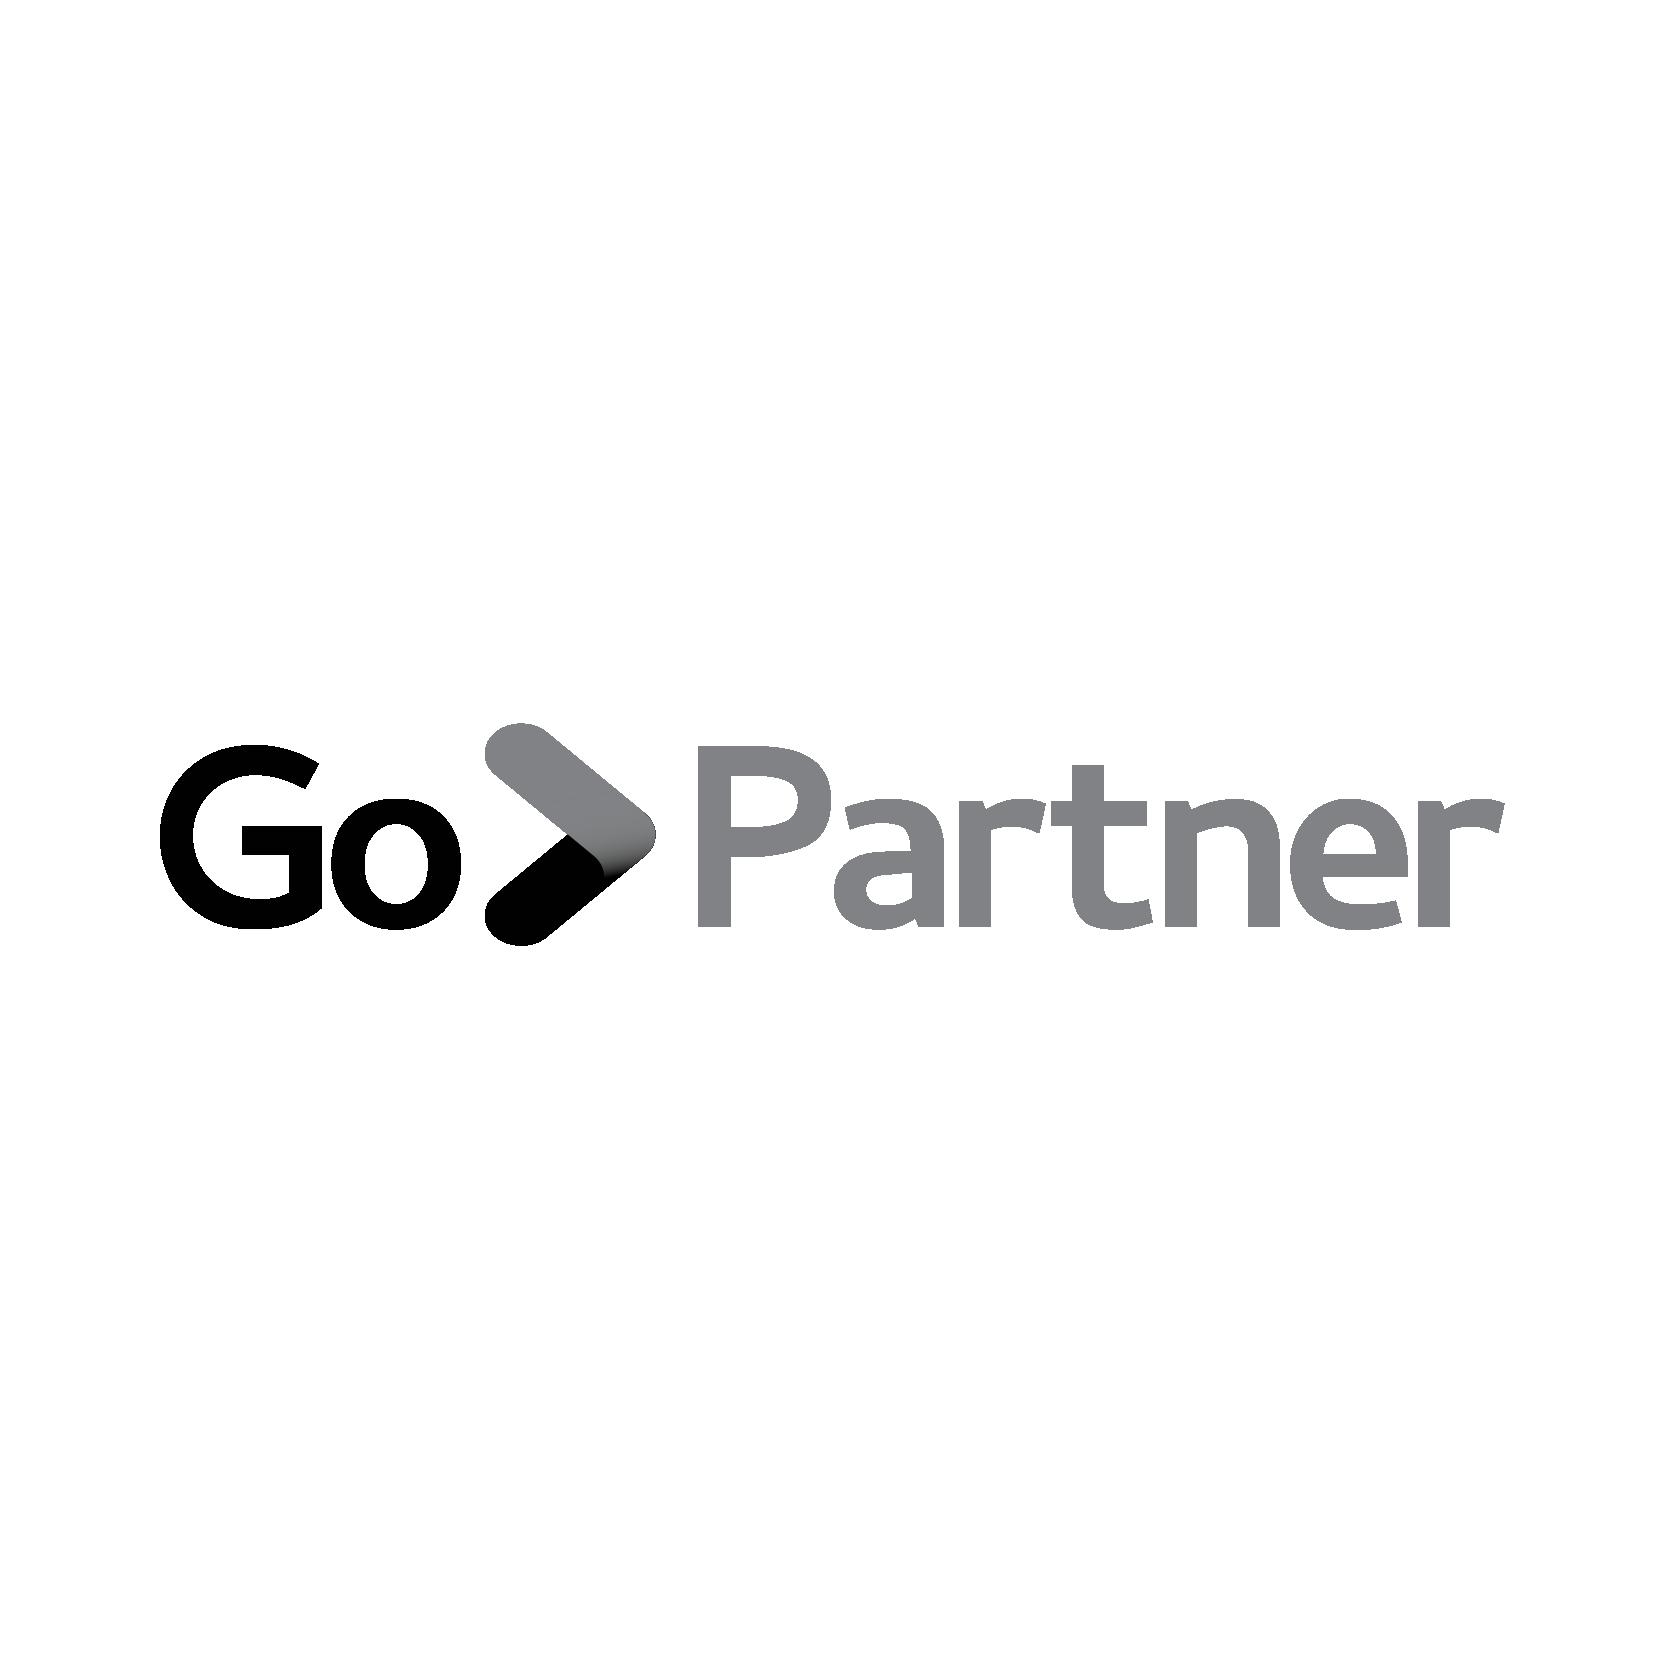 GoPartner client logo